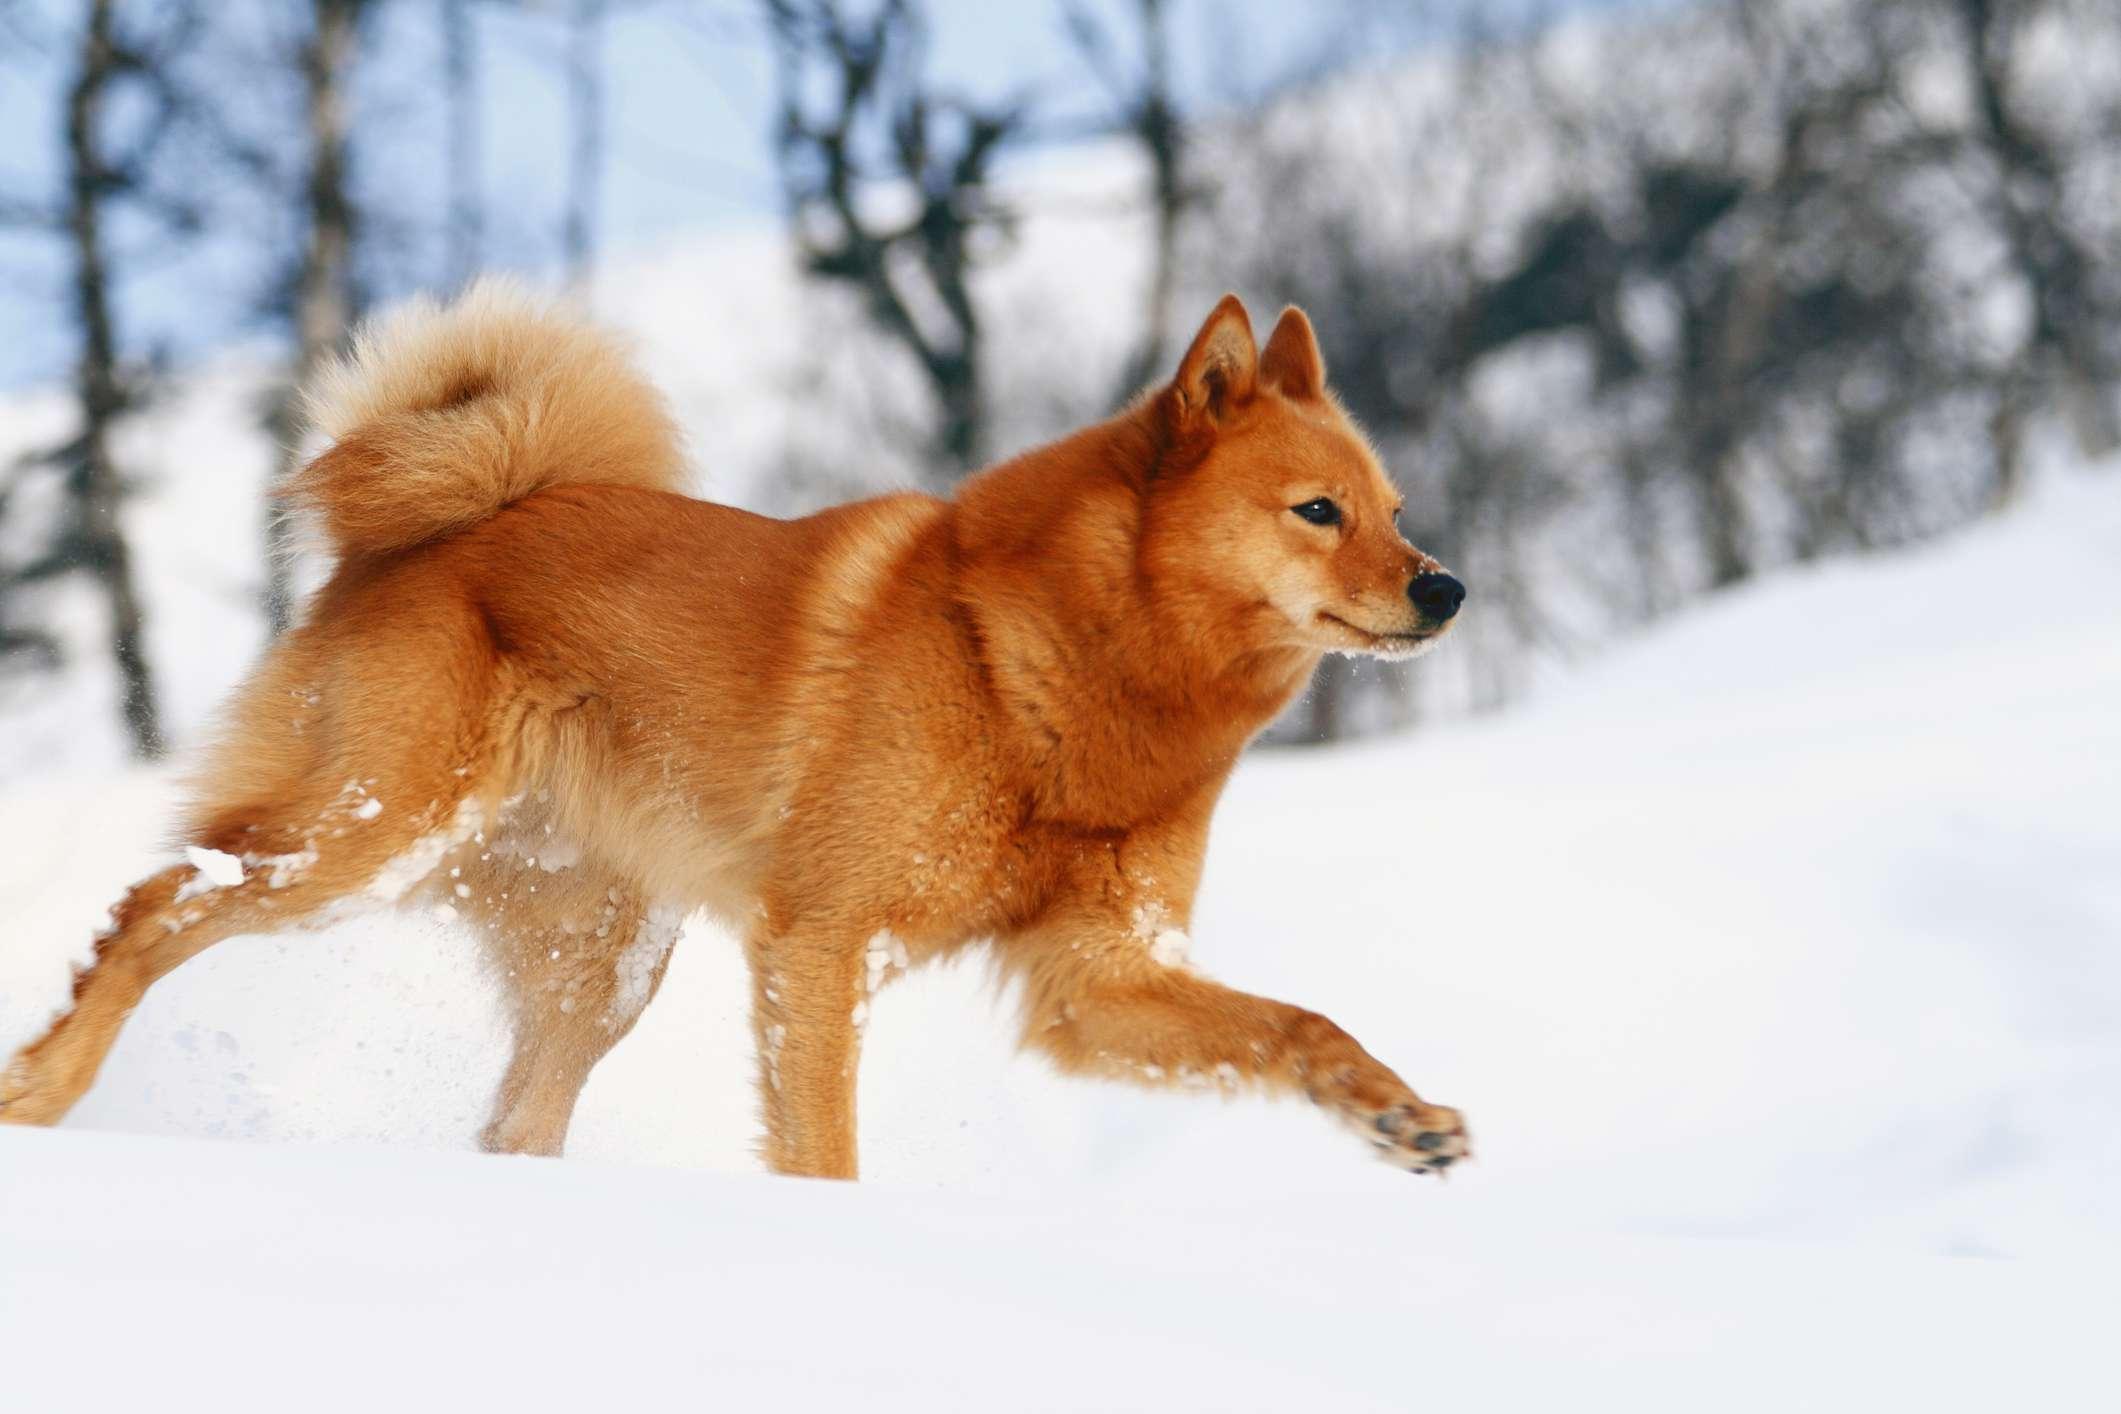 Finnish Spitz trotting through the snow